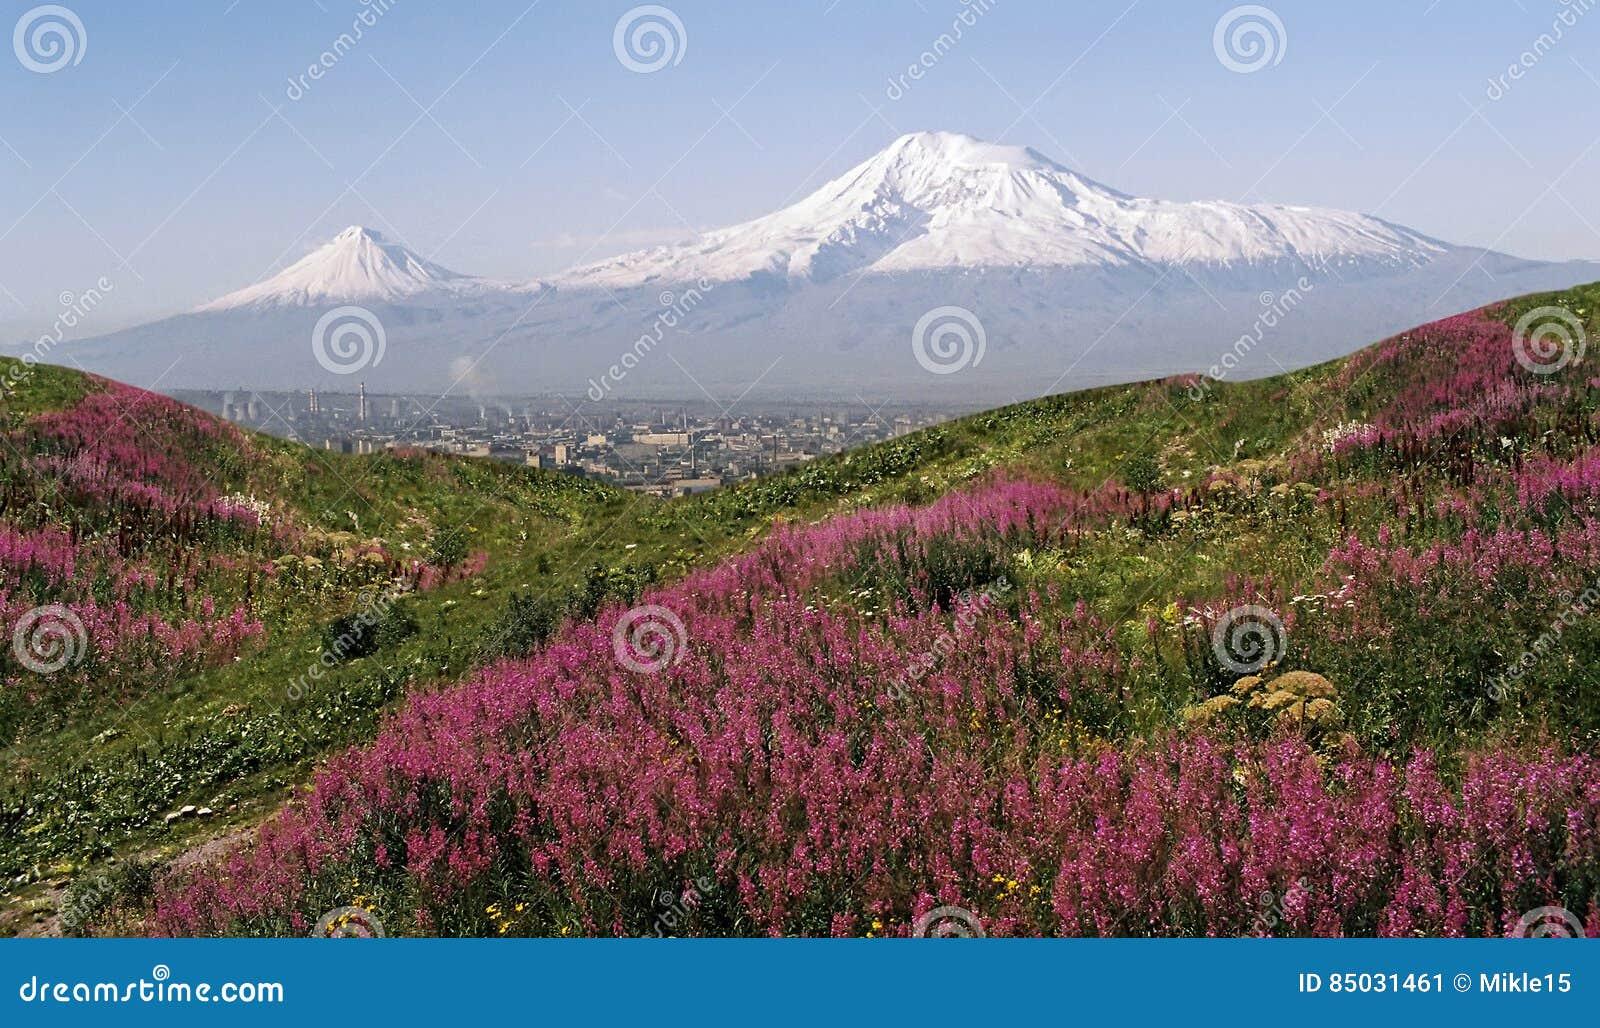 View of Mountain Ararat